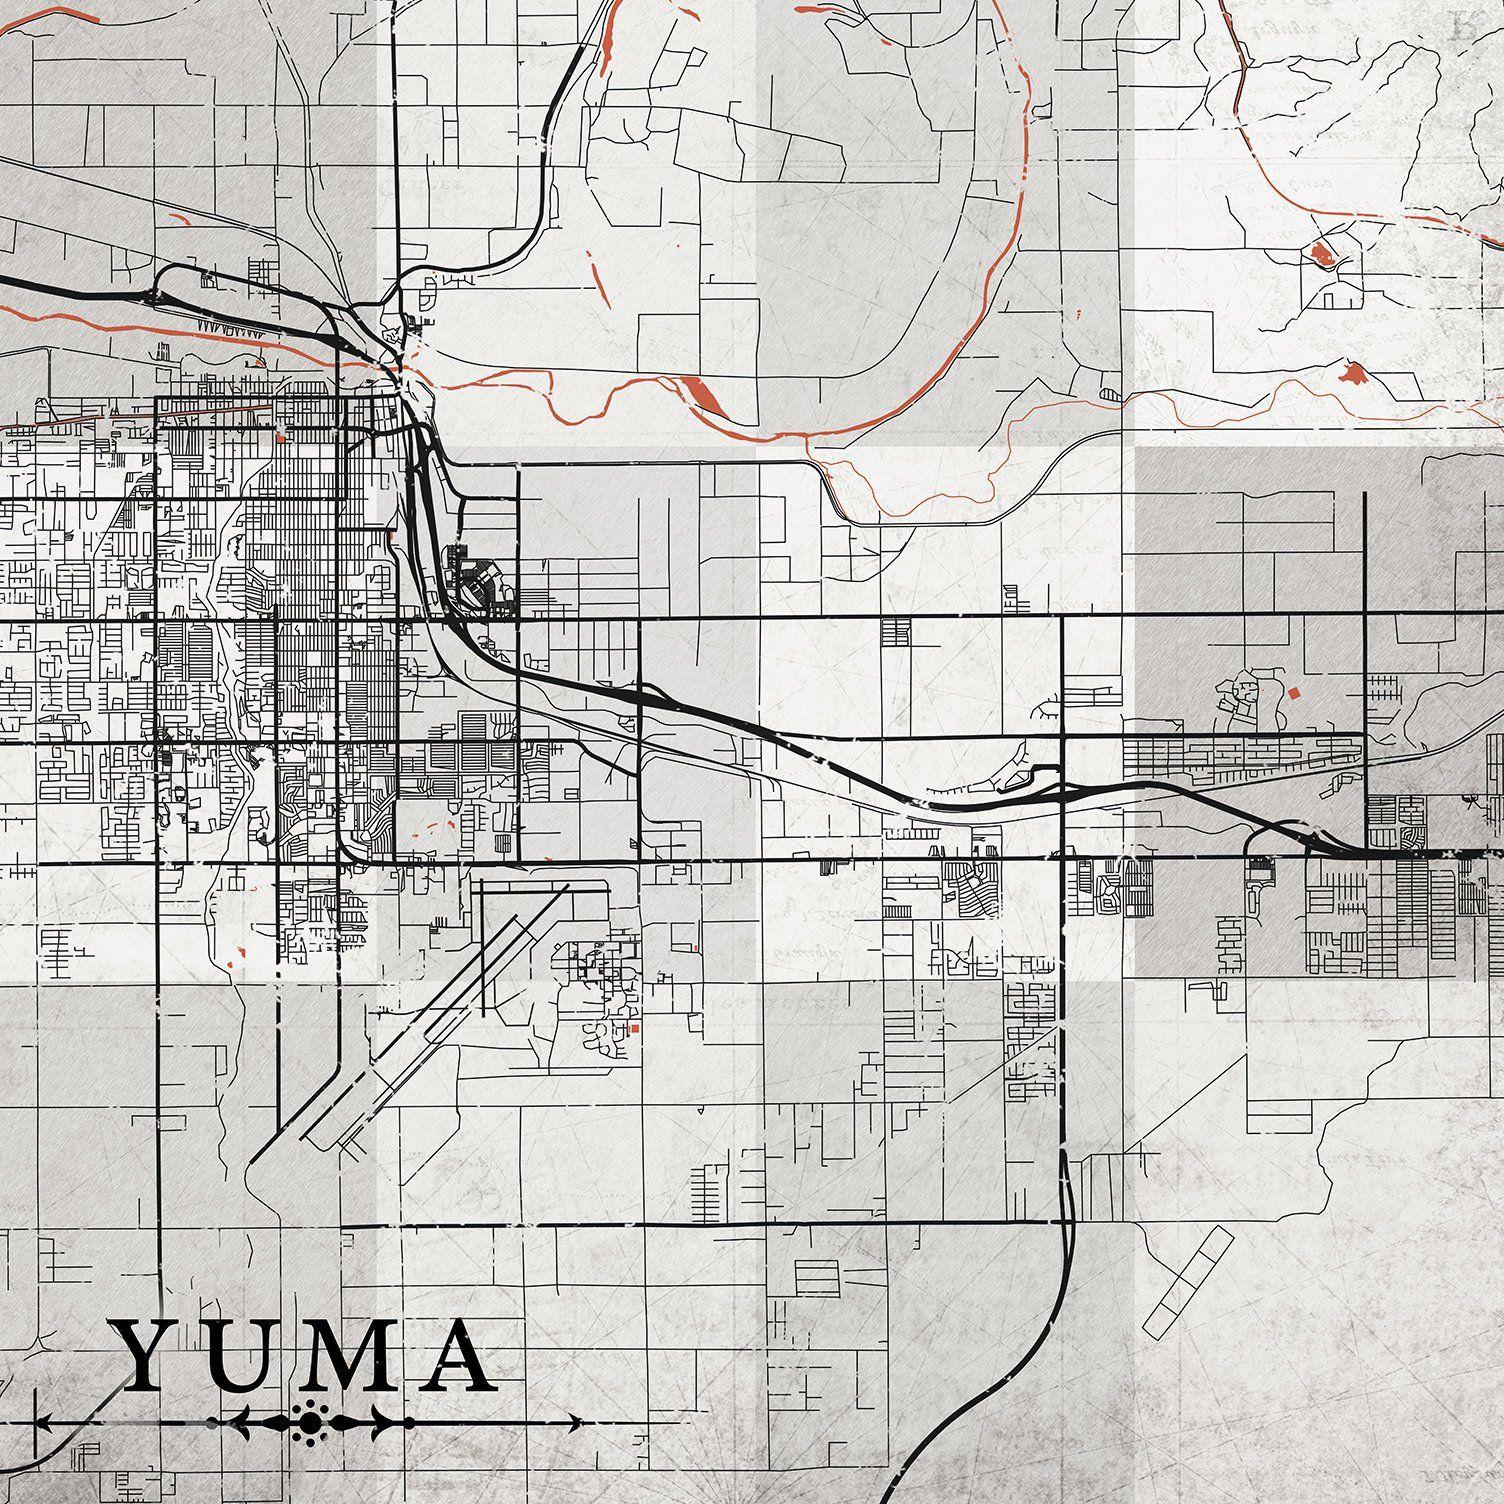 Street Map Of Yuma Arizona.Yuma Az Canvas Print Az Arizona Vintage Map Yuma Town City